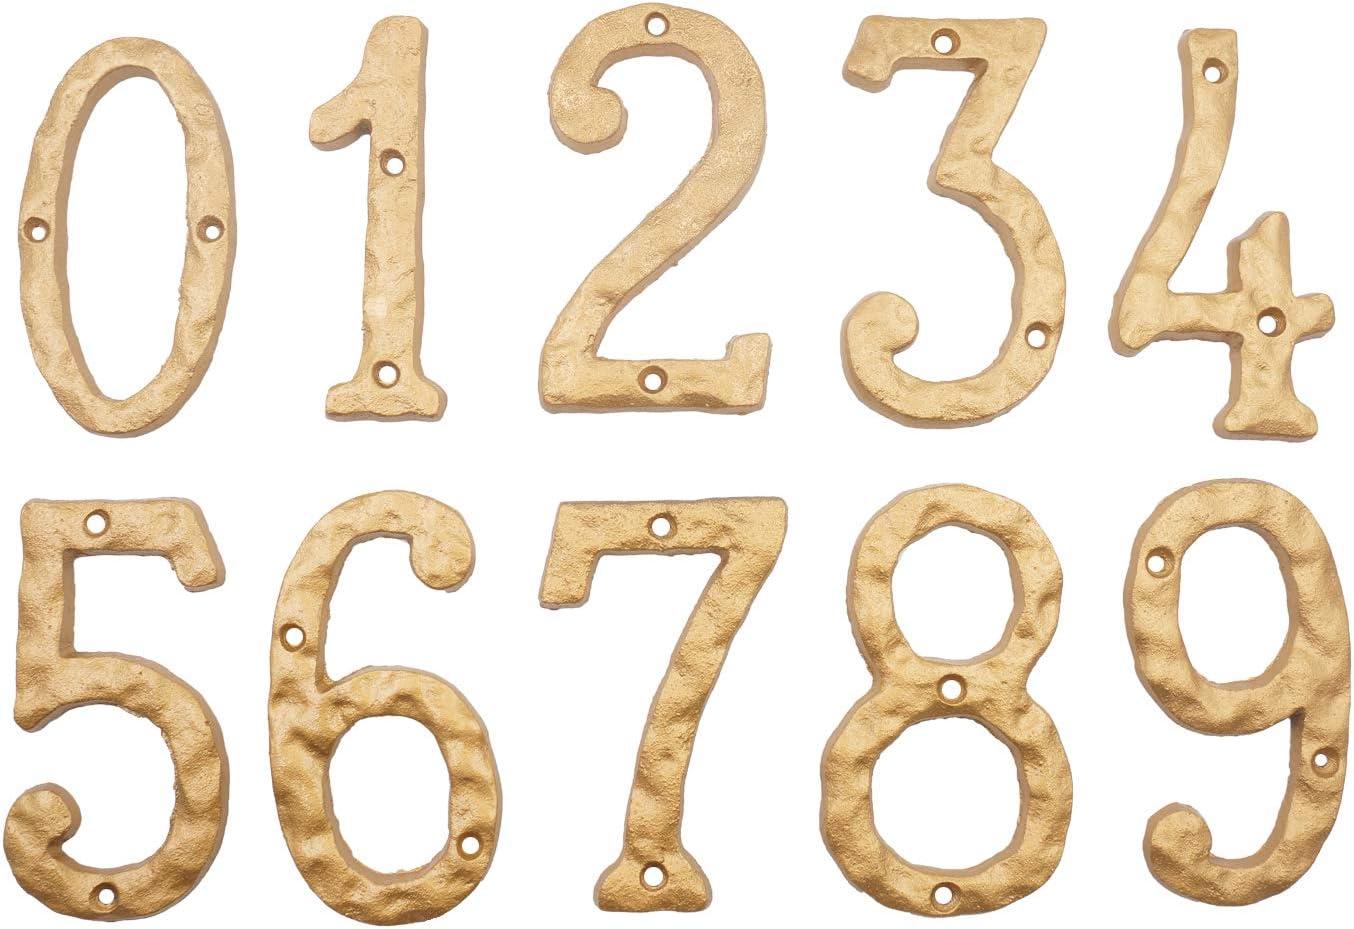 Hausnummern massives Gusseisen 15,2 cm einzigartiges Hammeroptik mit elegantem goldfarbenem Finish